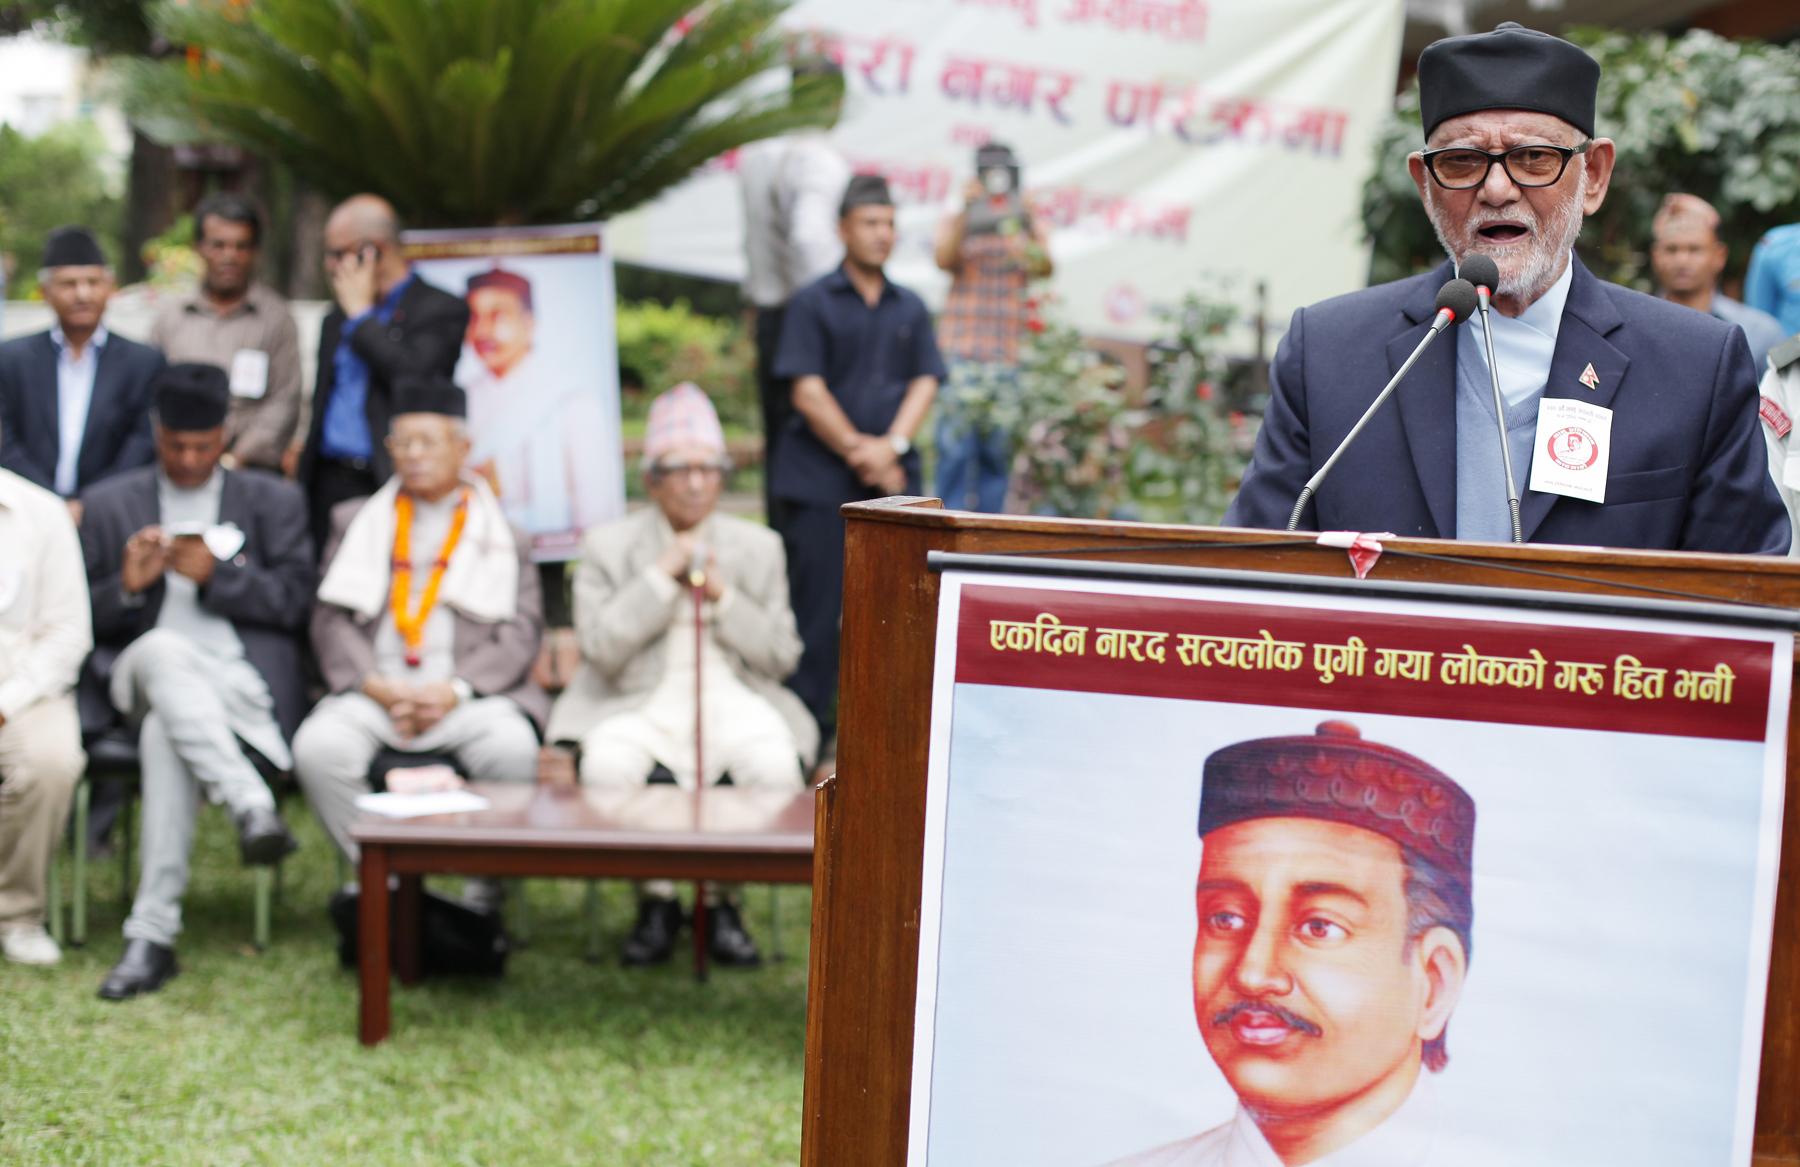 Prime Minister Sushil Koirala addressing a programme organised by the Bhanu Foundation on the occasion of 202 birth anniversary of Adikavi Bhanubhakta Acharya at Nepal Academy in Kamaladi on Tuesday, July 14, 2015. Photo: RSS